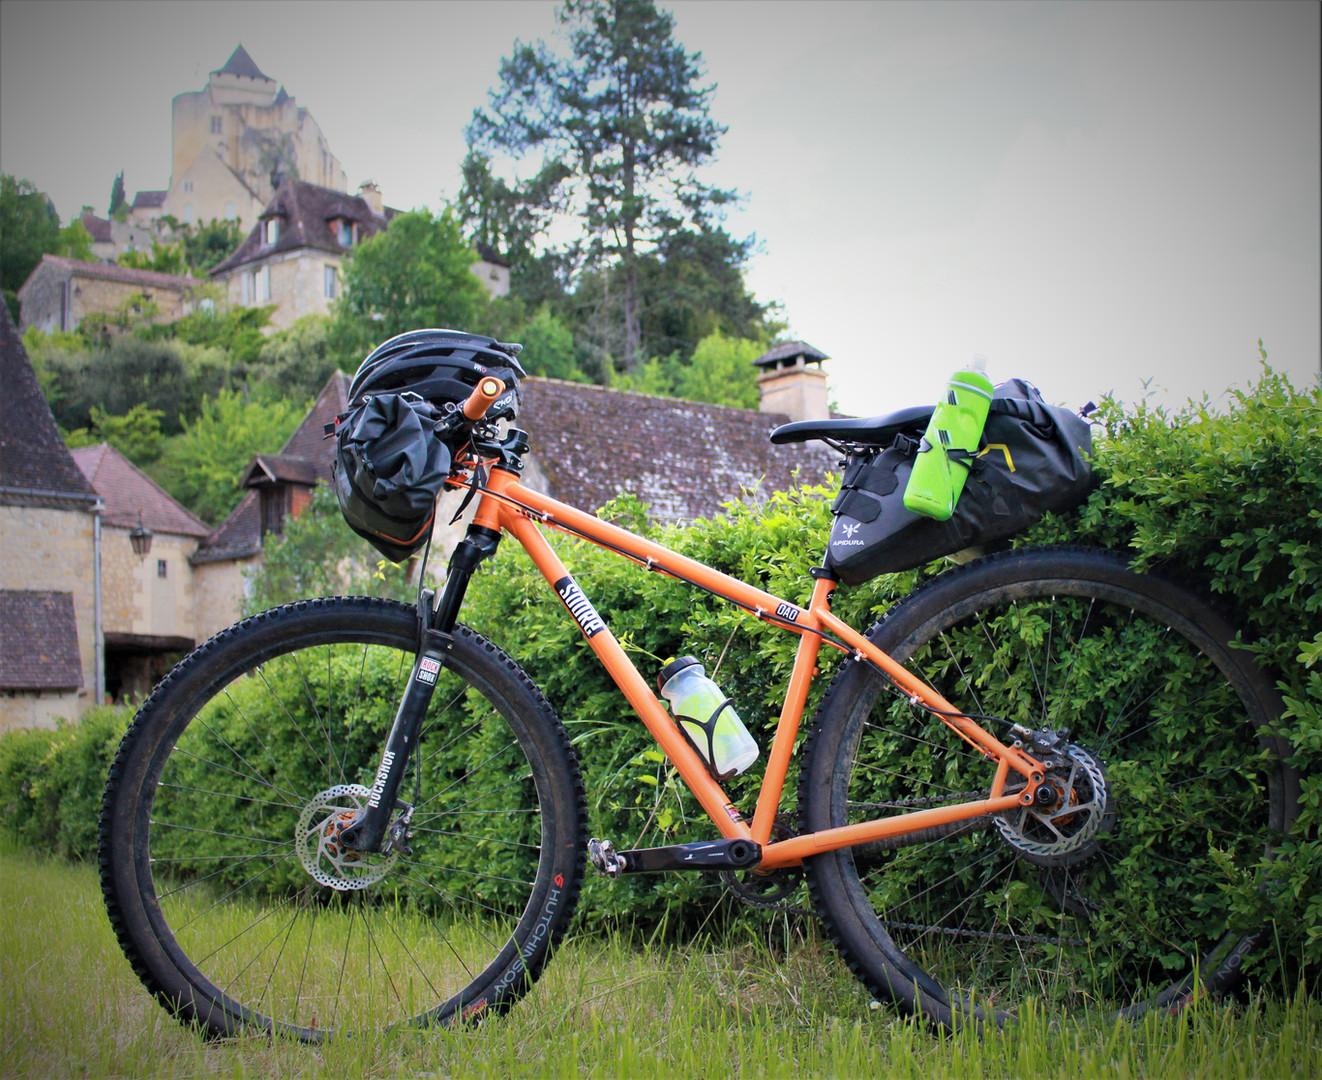 bike packing adventure in dordogne france